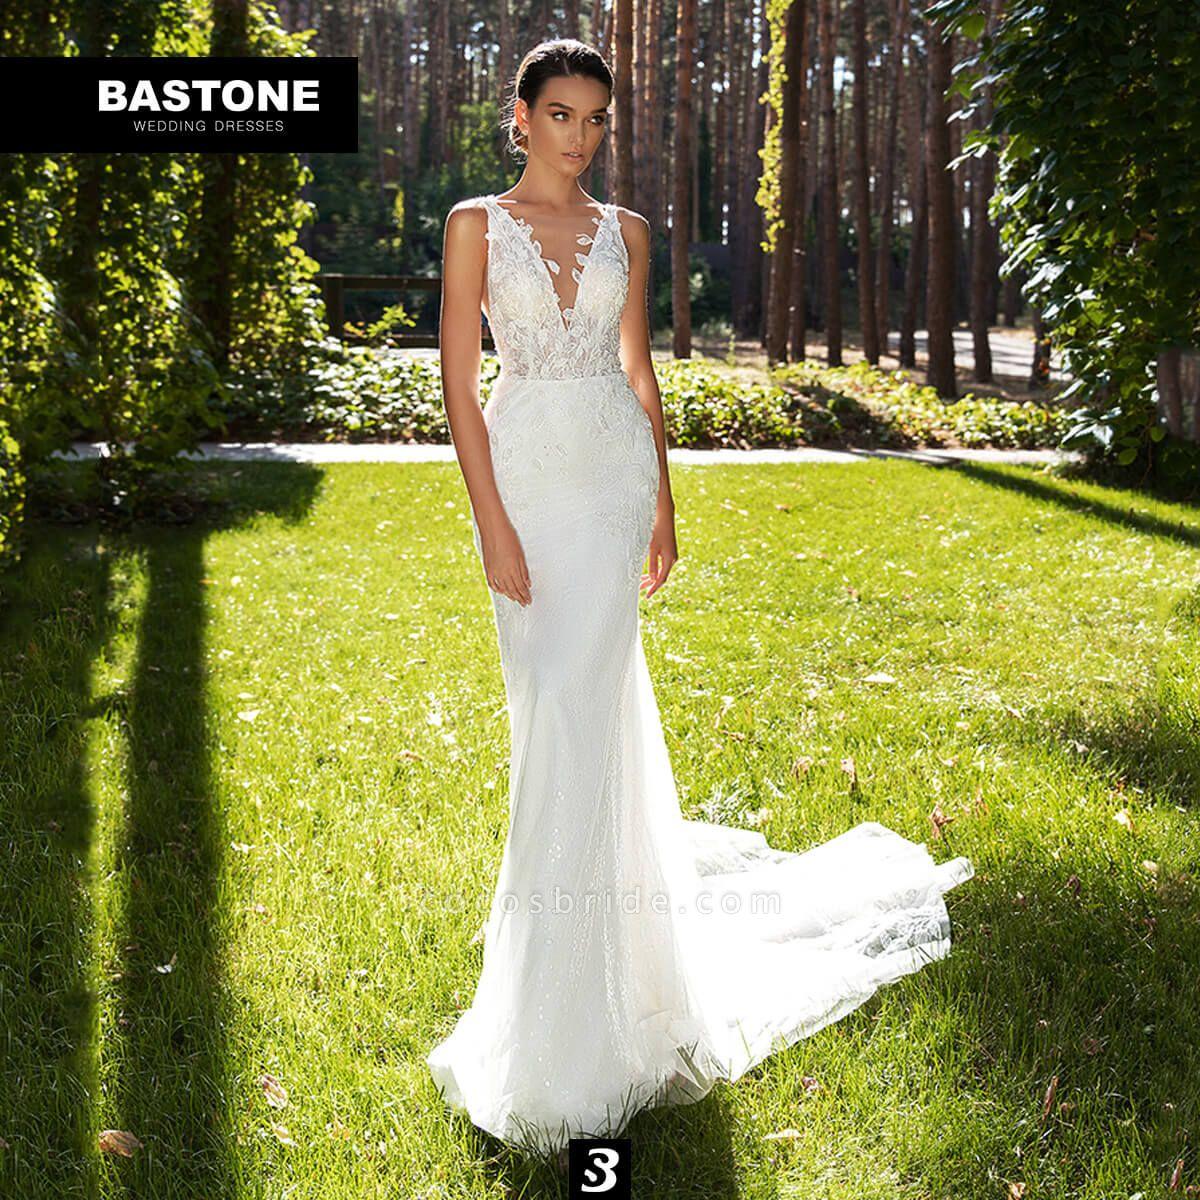 CN267L Wedding Dresses Mermaid NEW 2021 Collection